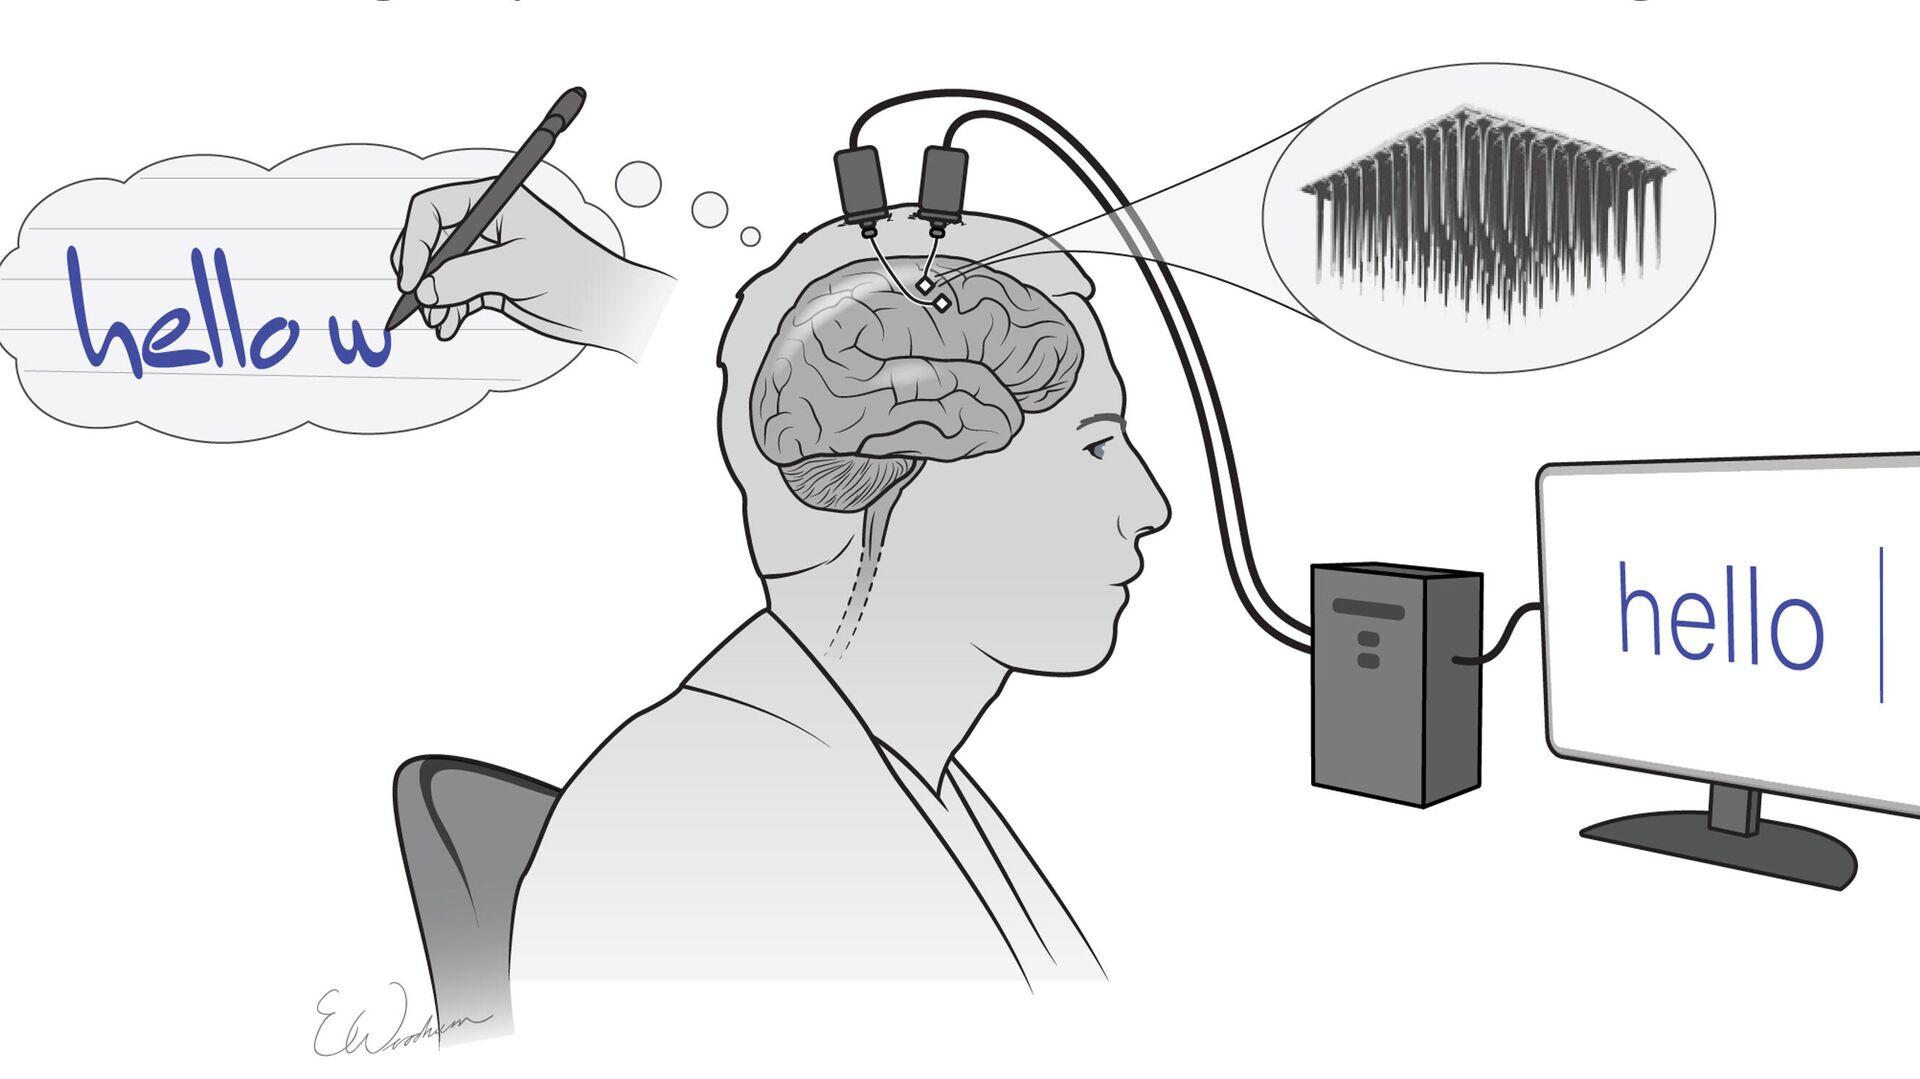 Предложена новая гипотеза, объясняющая природу сновидений